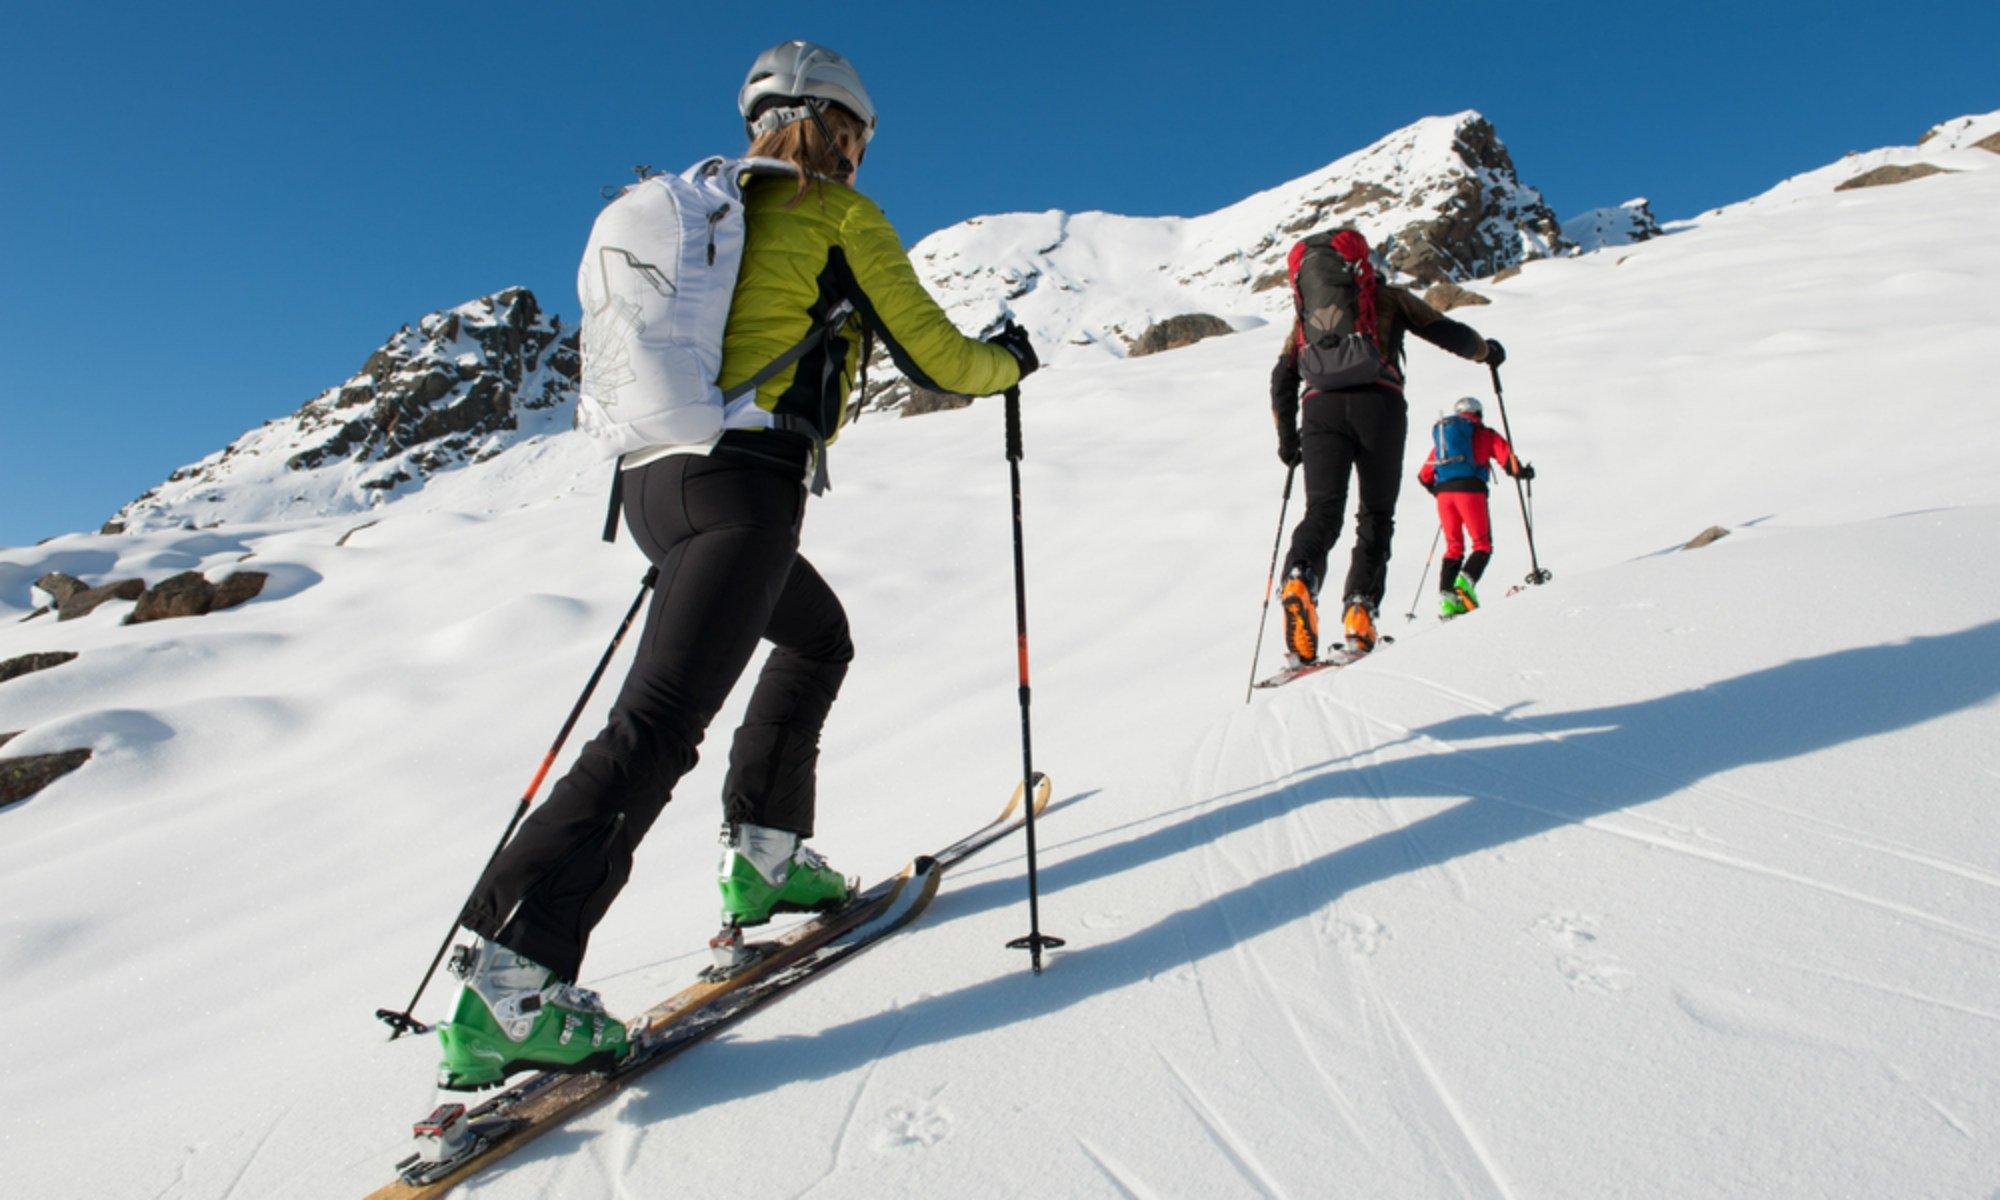 Three people ski touring up a mountain.